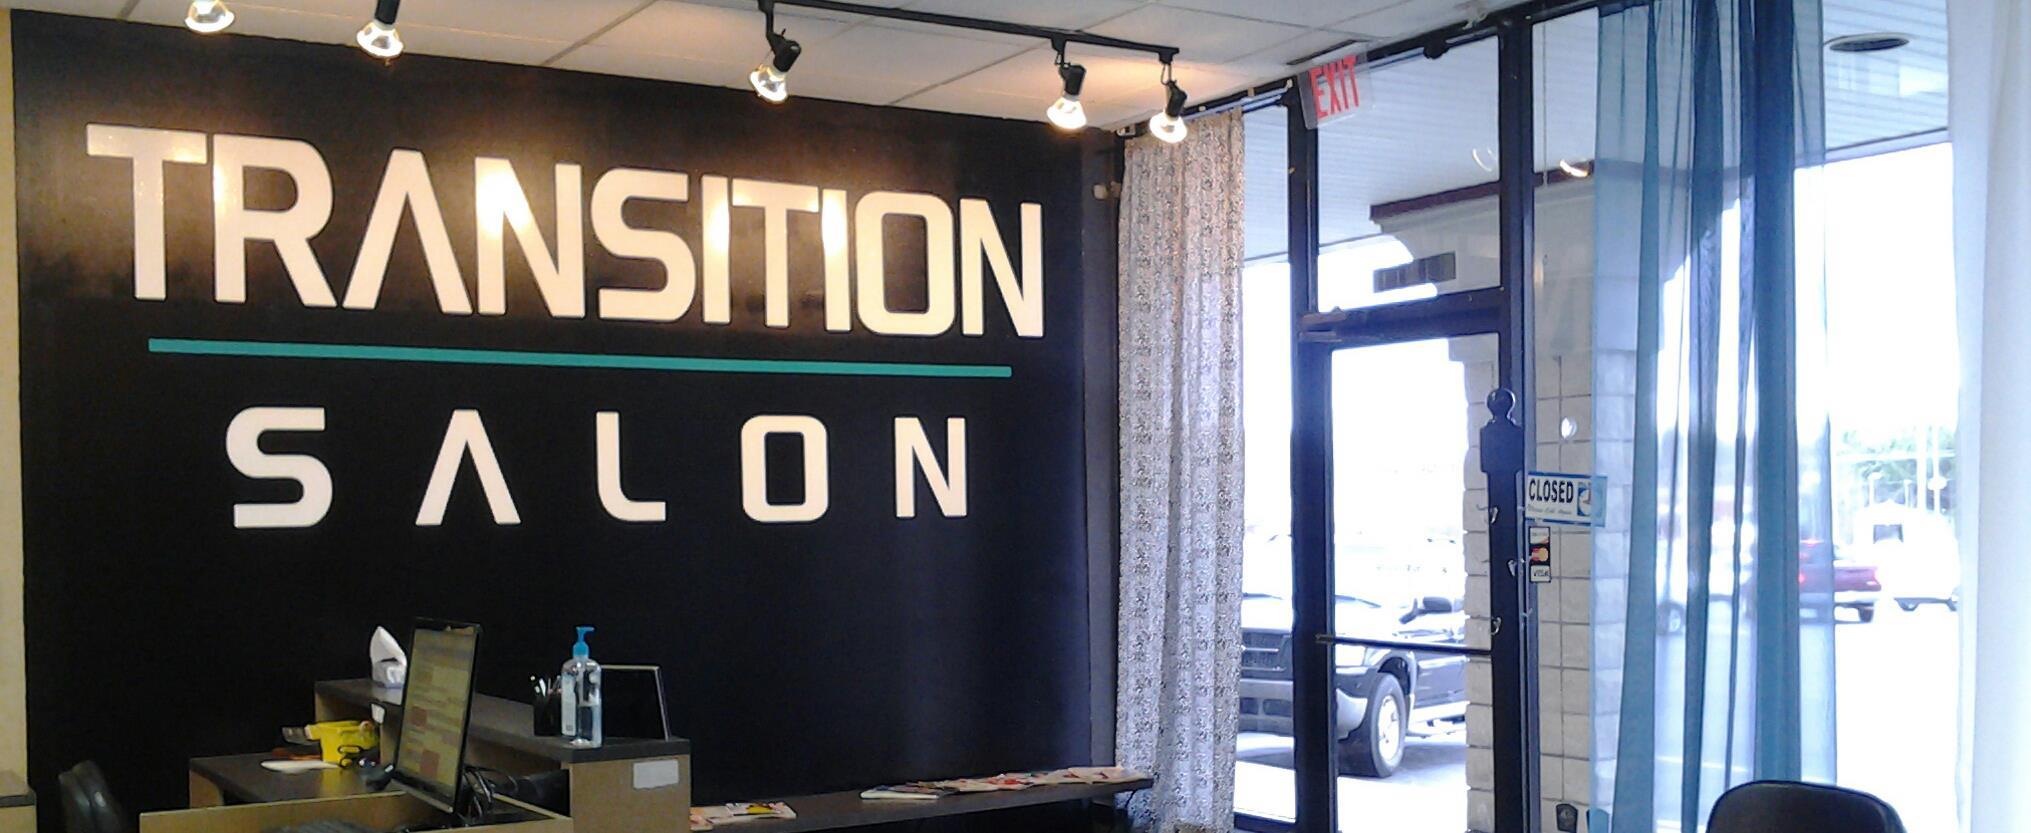 Transition Salon, Easley SC